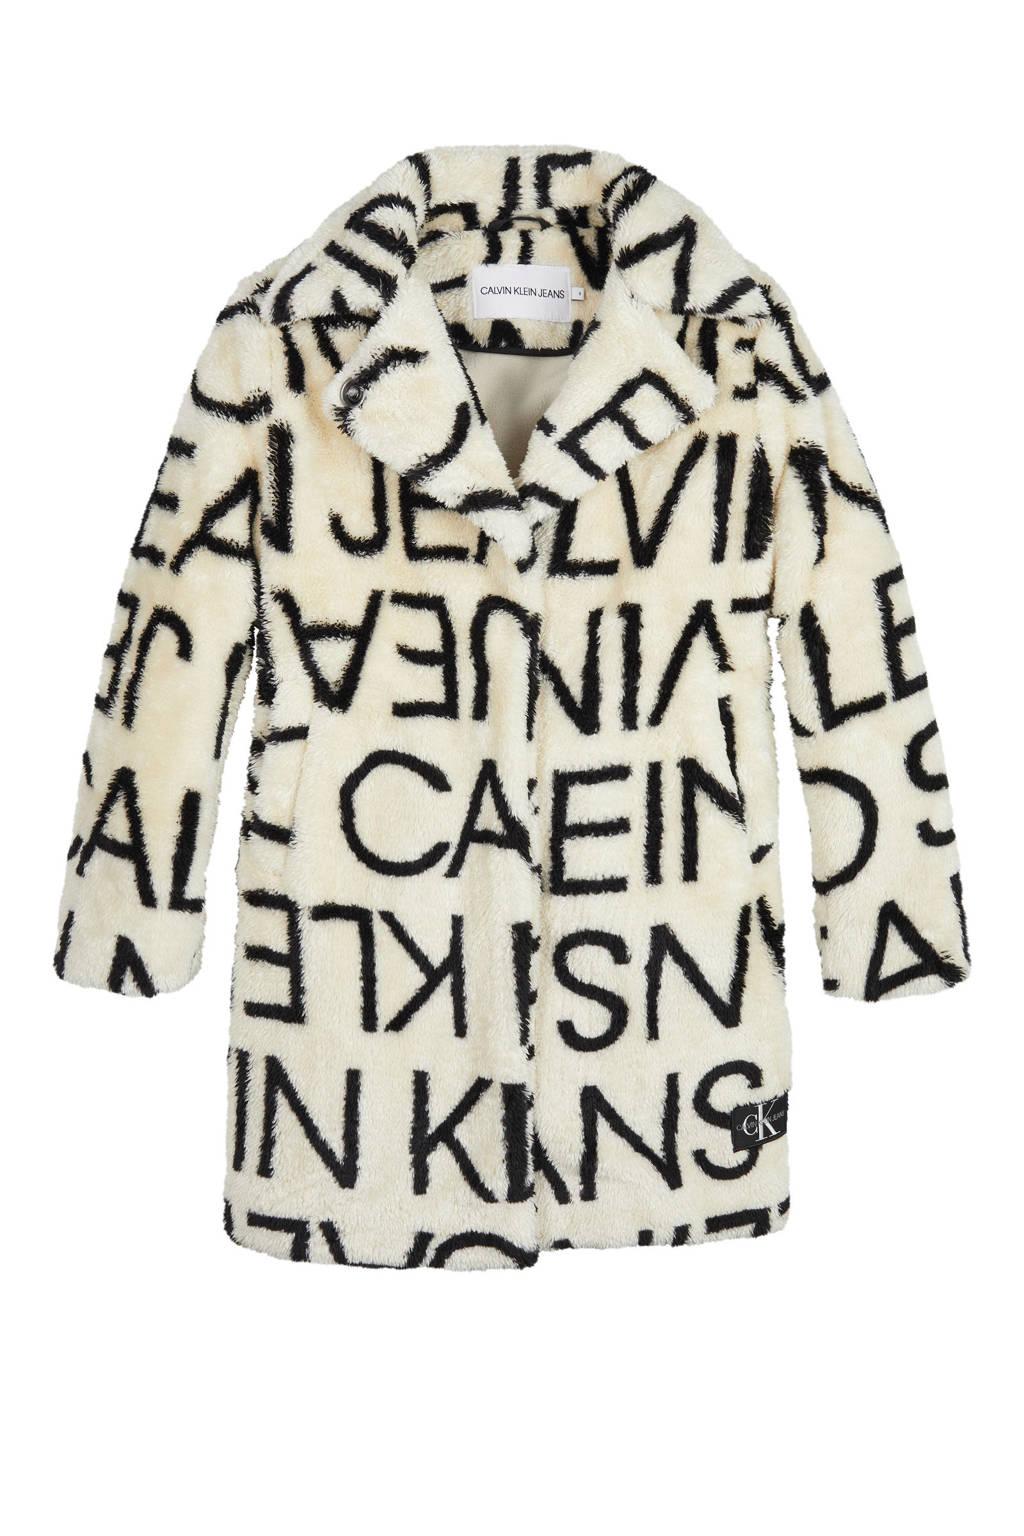 CALVIN KLEIN JEANS teddy winterjas met logo ecru/zwart, Ecru/zwart